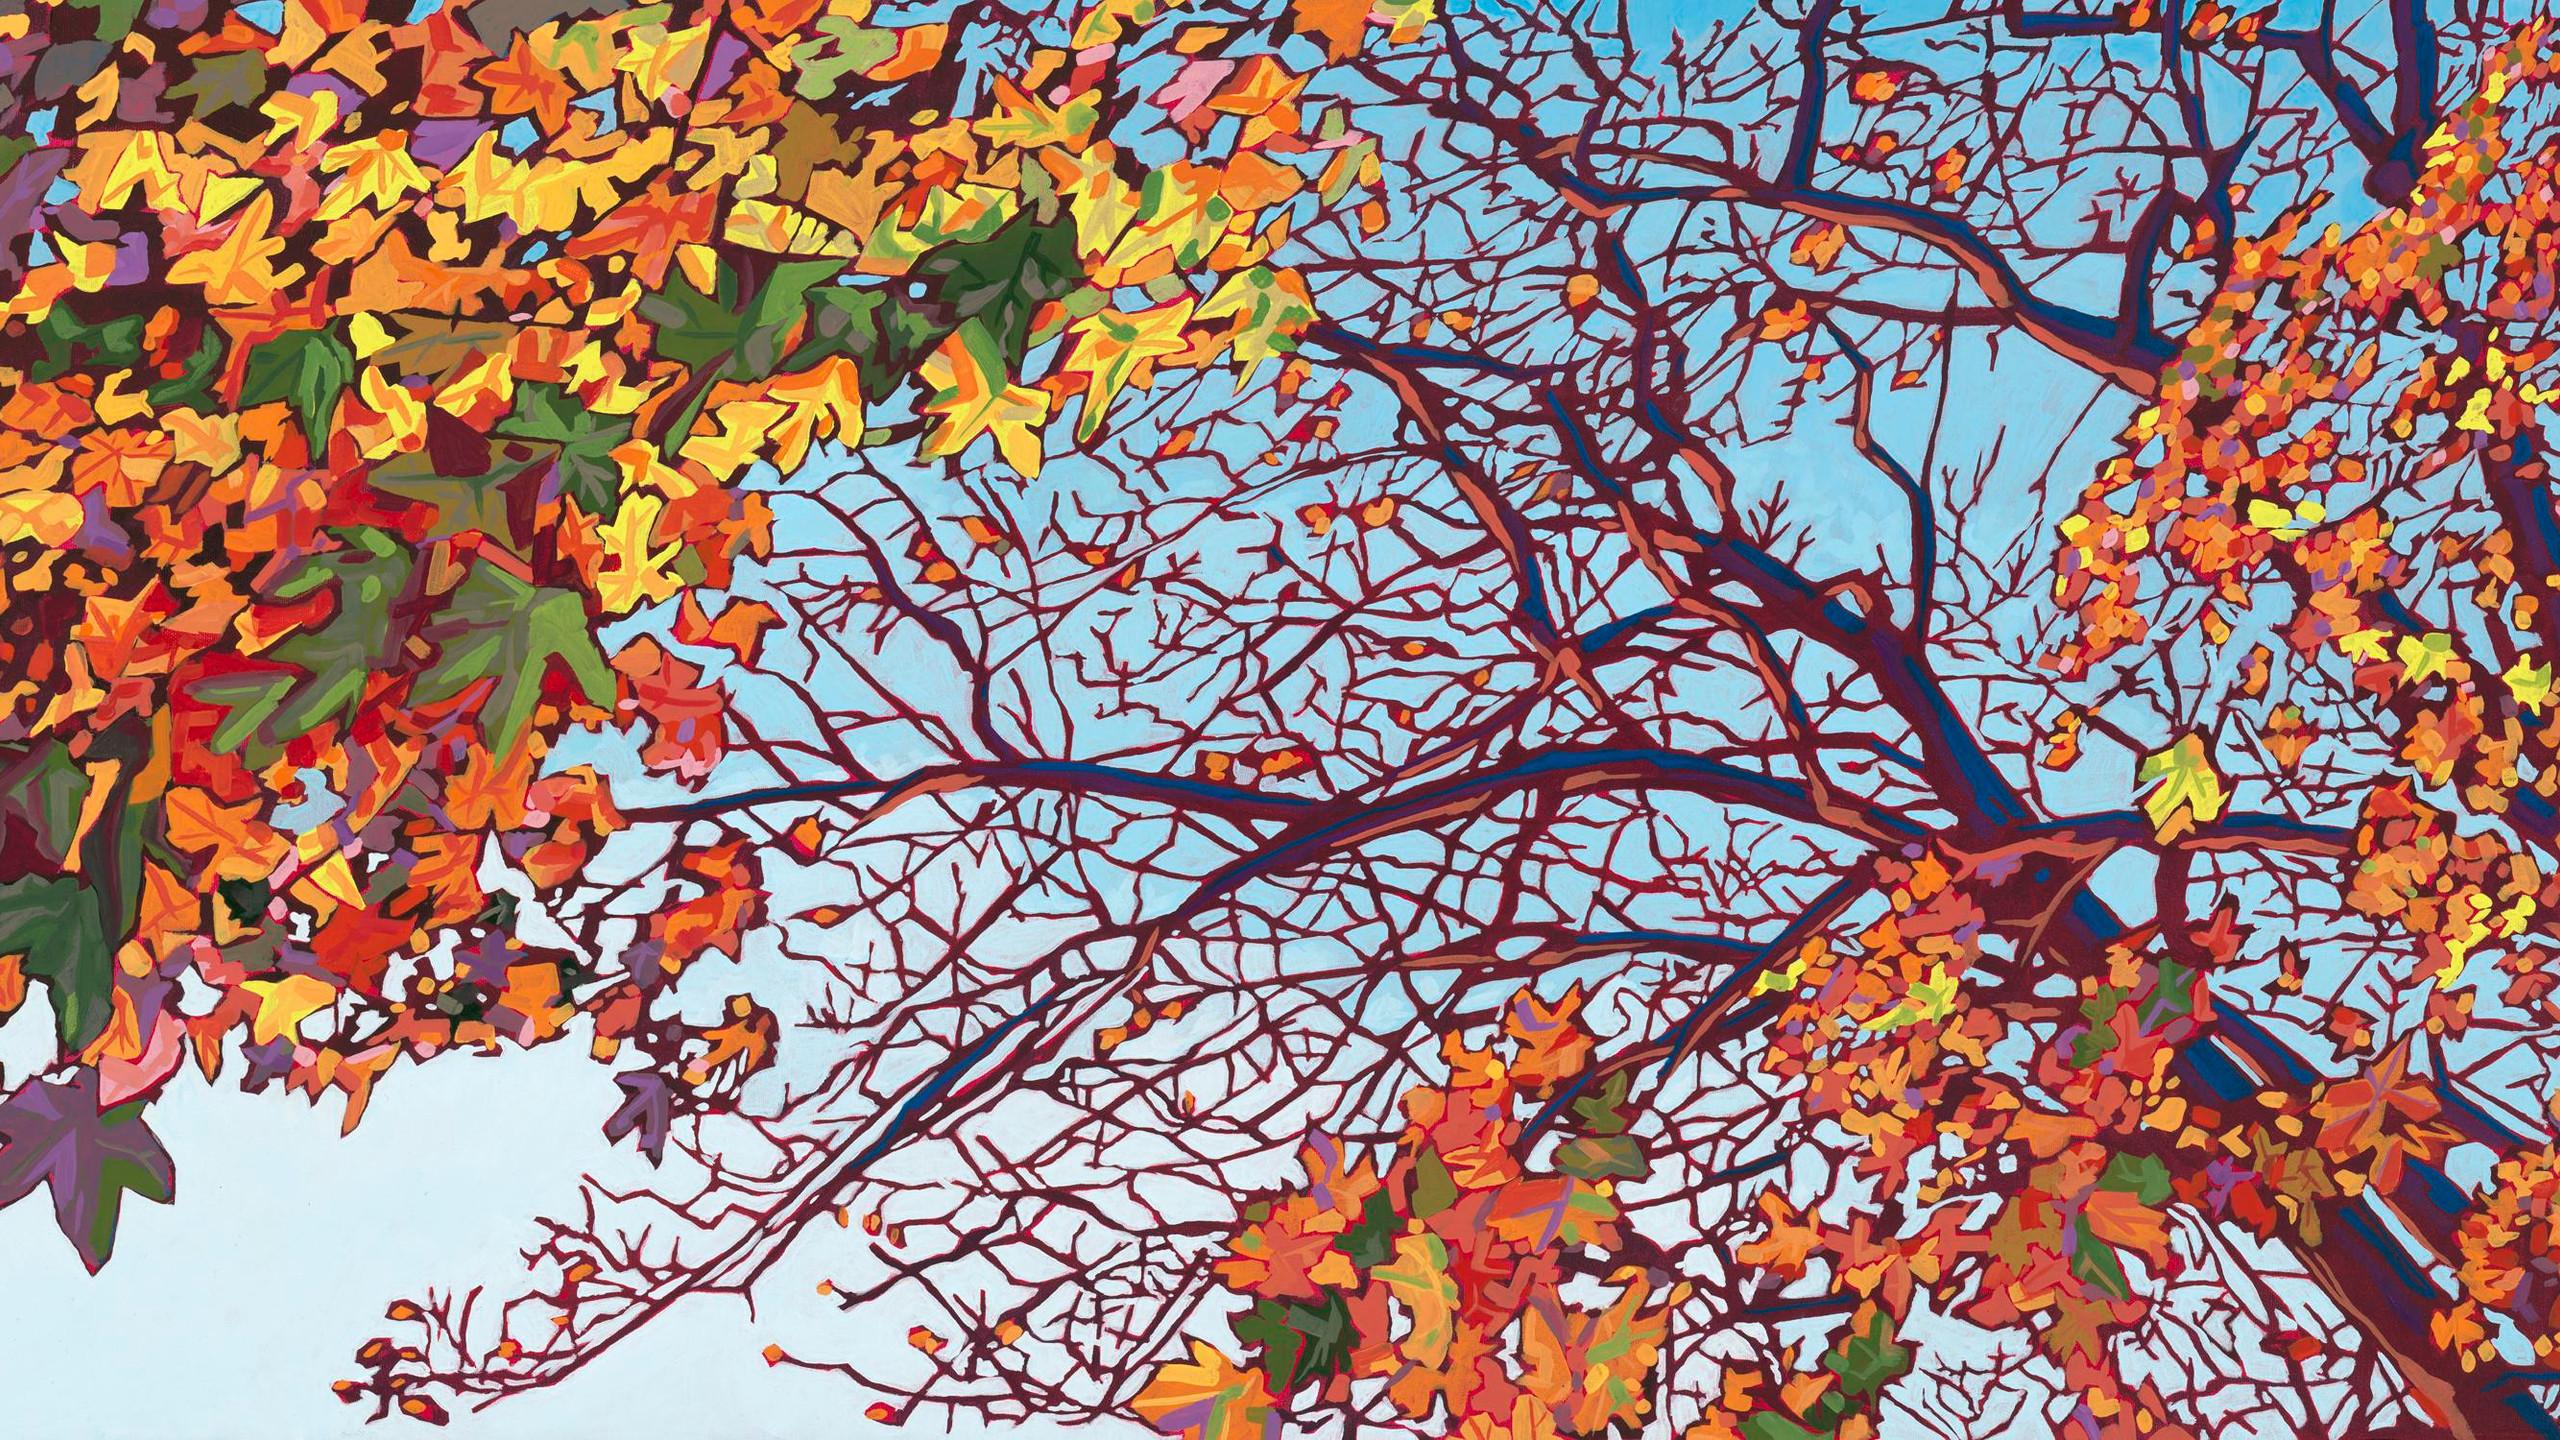 Lathrop, Mike - Fall Sun on Graham Stree